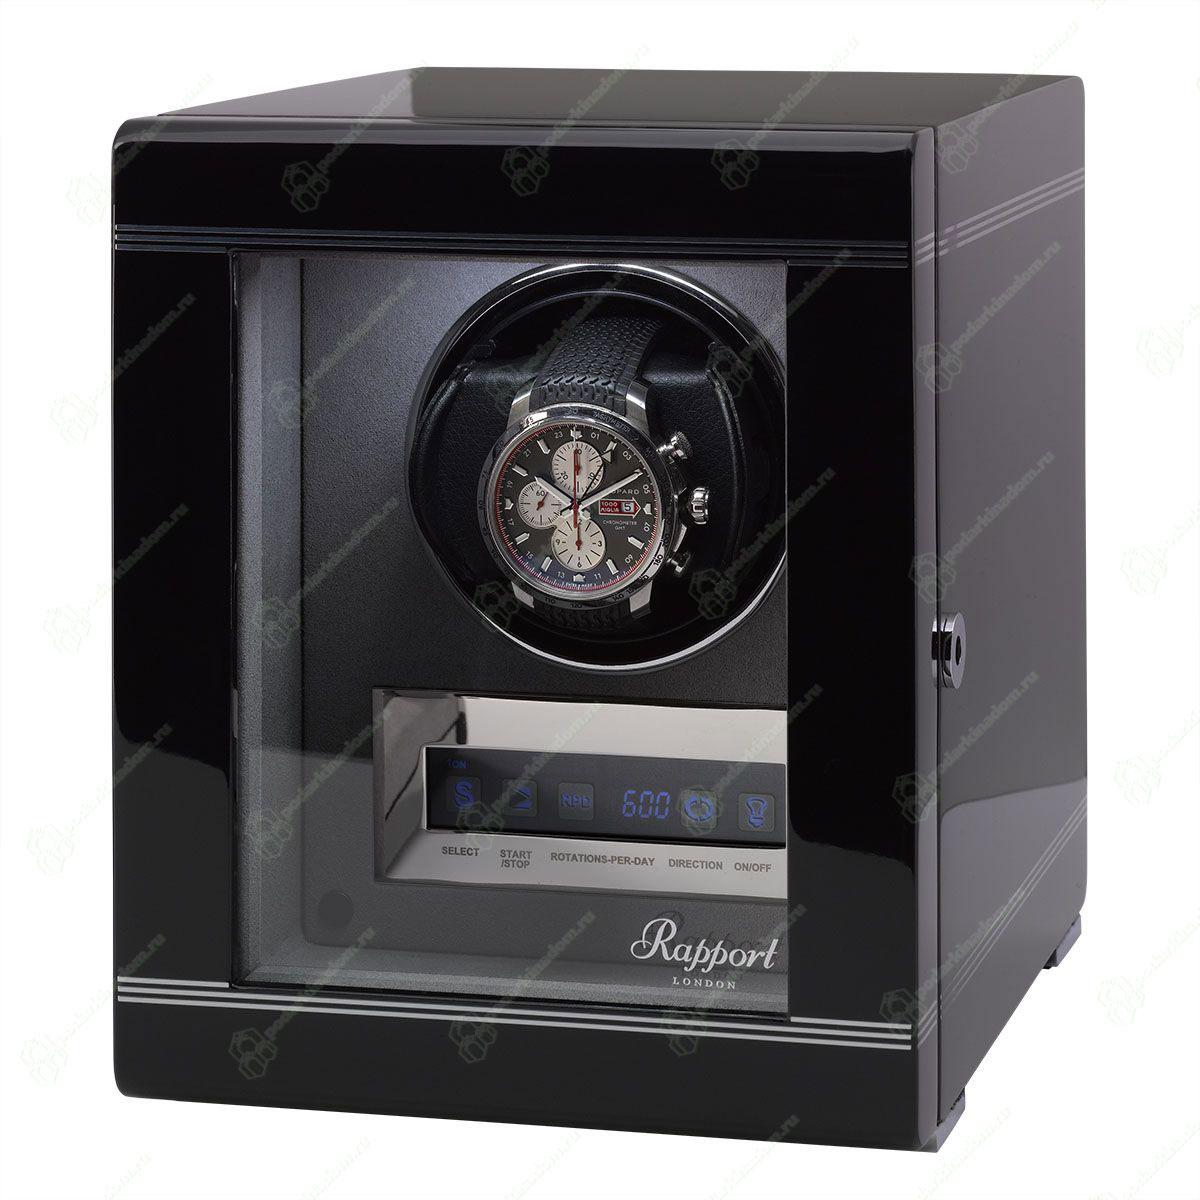 W551 Шкатулка для подзавода наручных часов